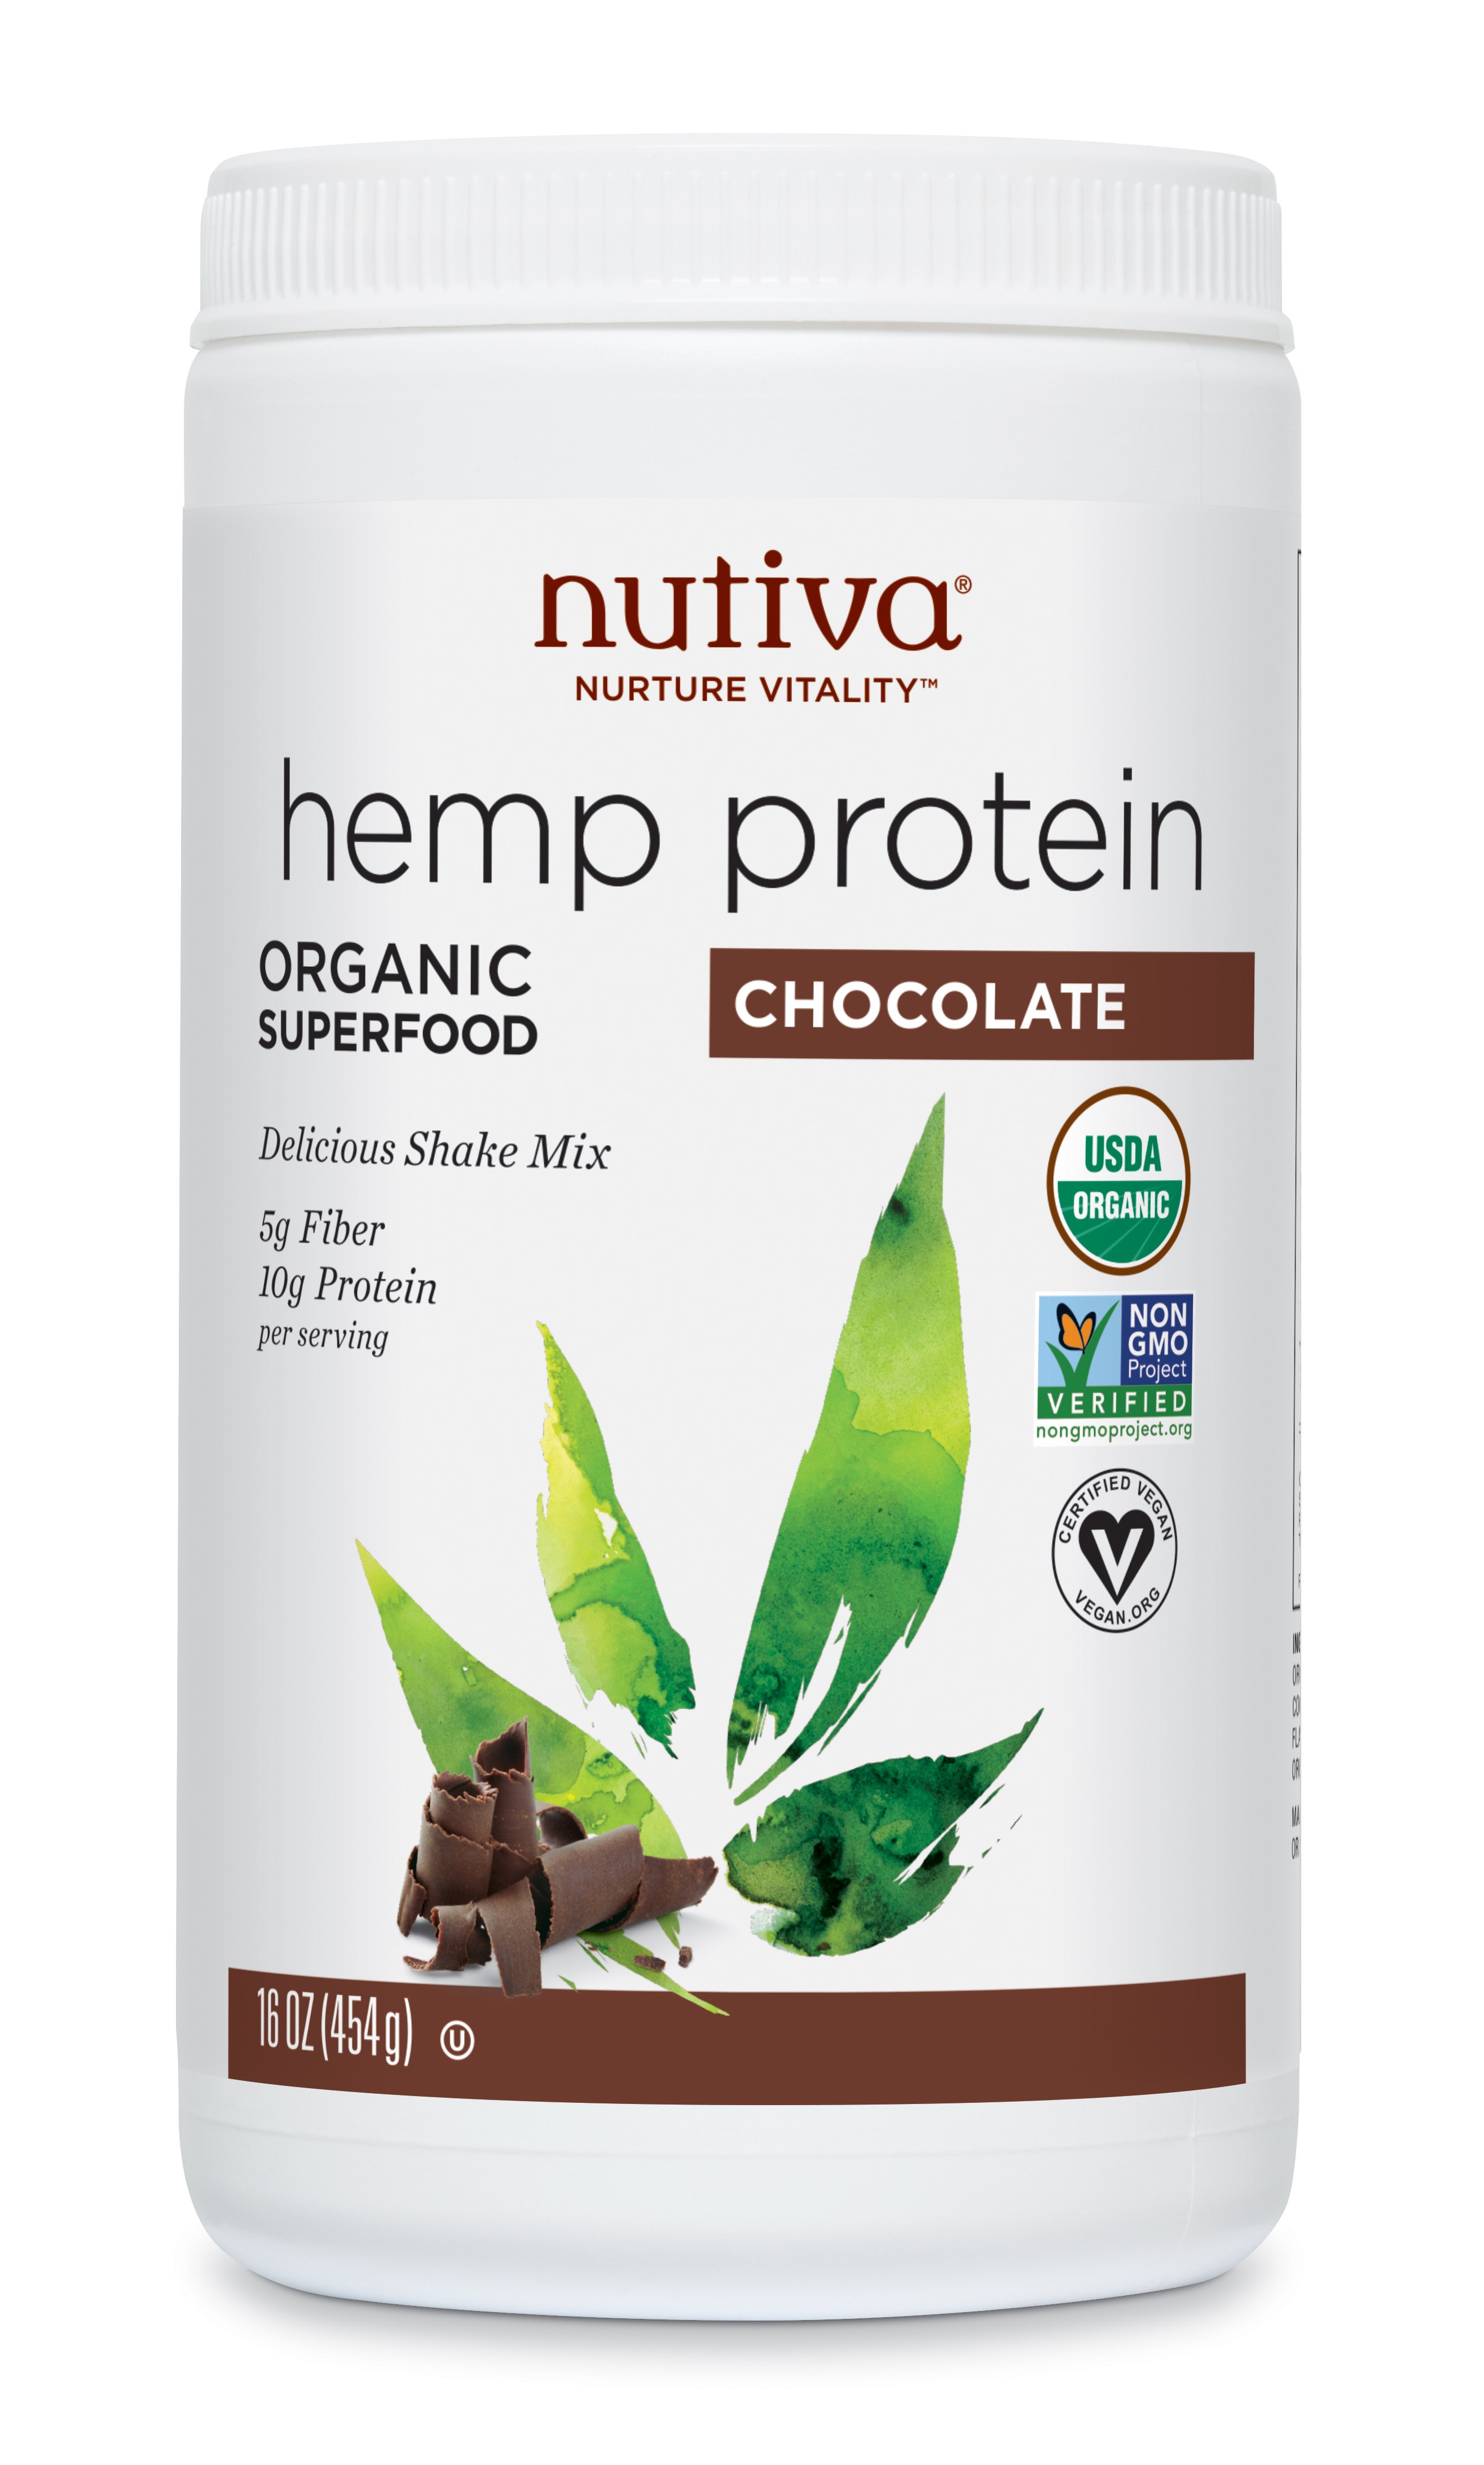 Nutiva Organic Hemp Protein Powder Chocolate 10g Protein 1 0lb 16 0oz Walmart Com Walmart Com